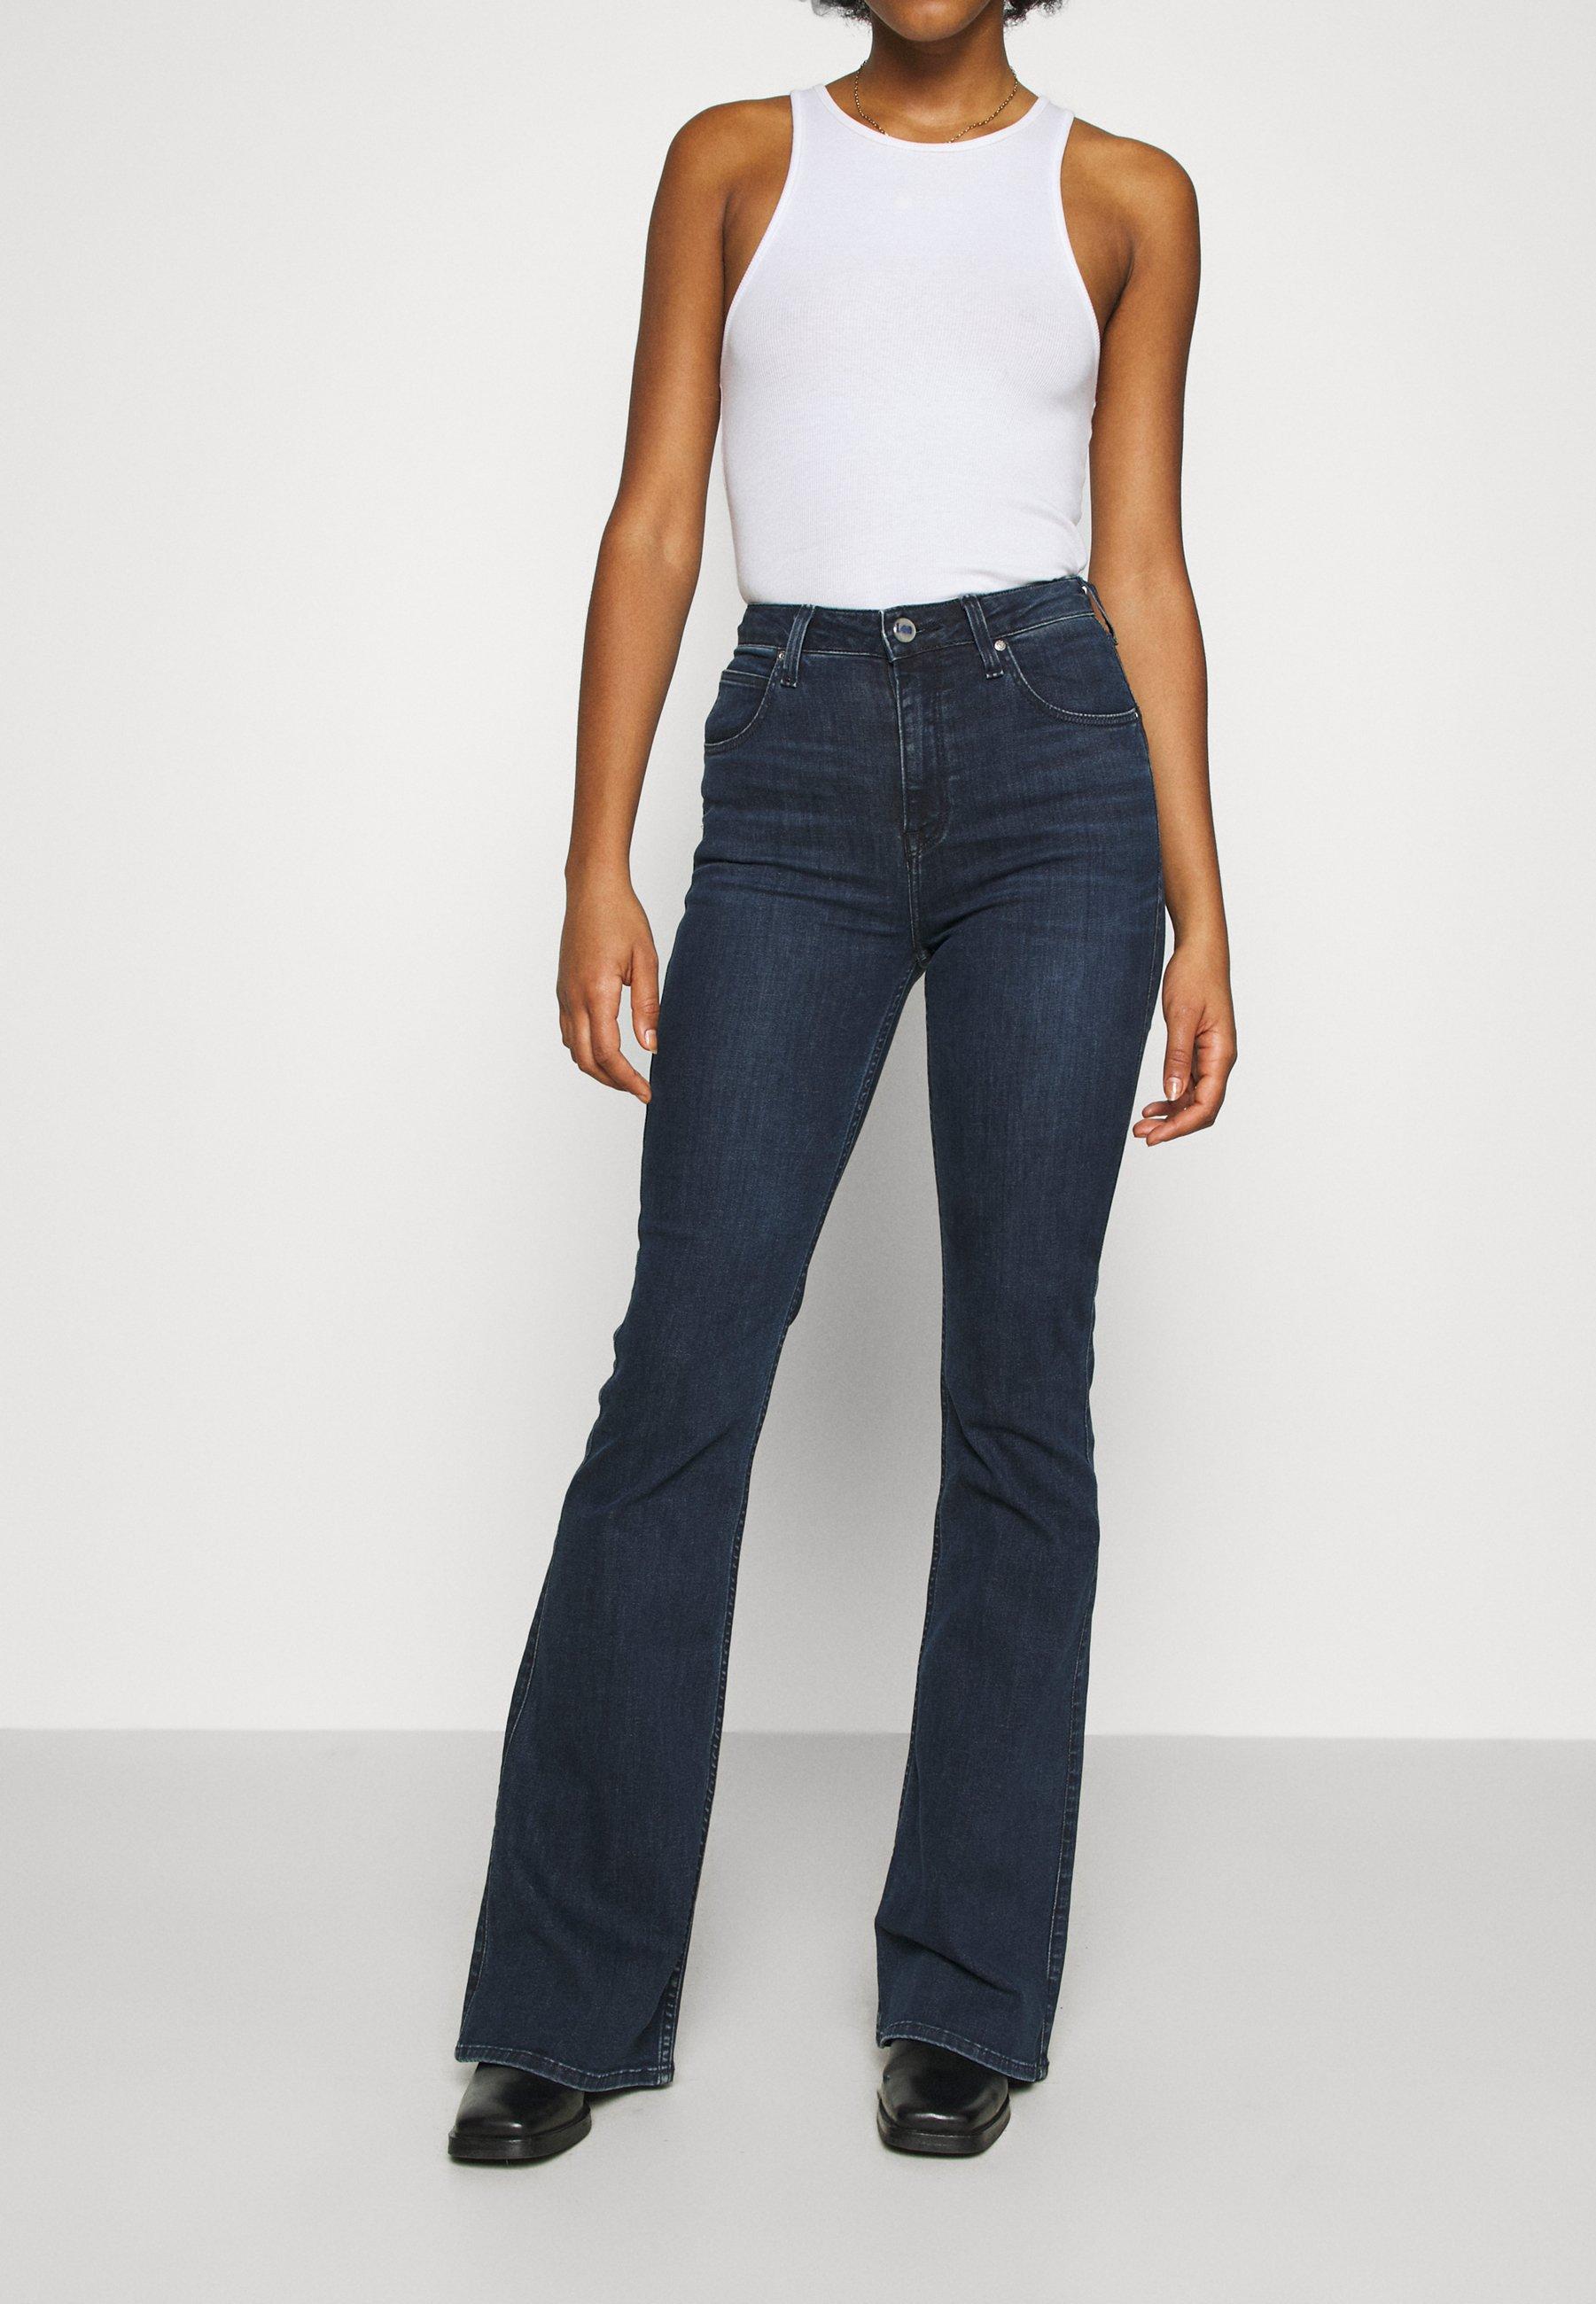 Lee Western Shirt (Blueprint) (799 kr) Lee Jeans |